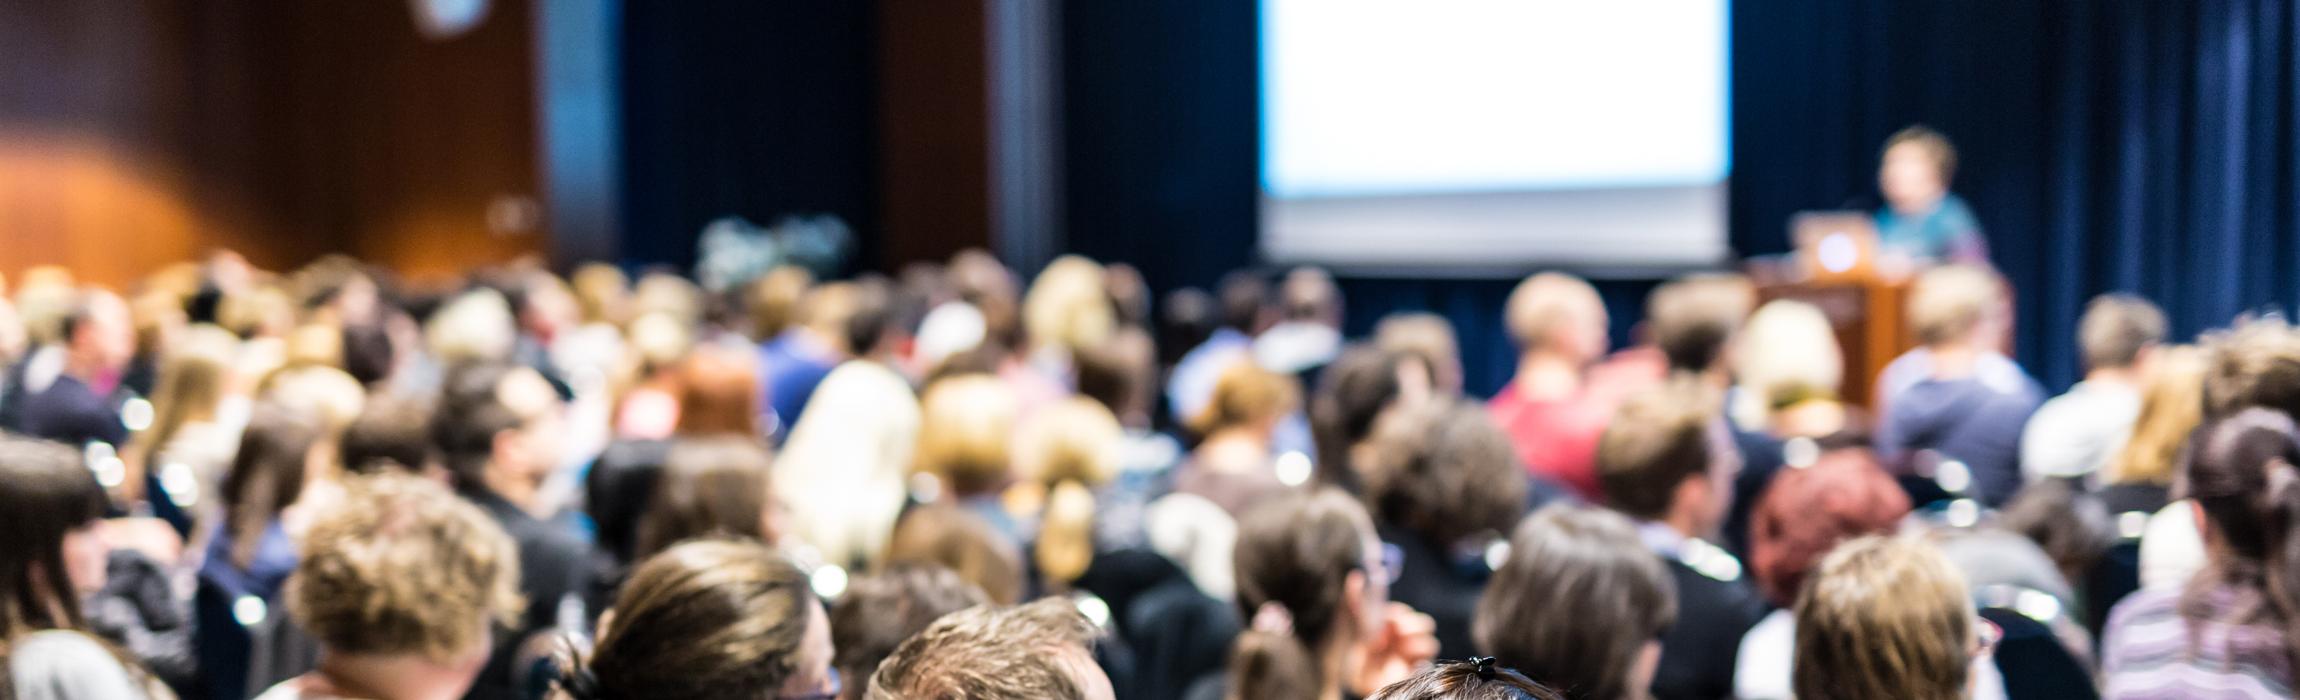 ny-33949342-speaker-giving-presentation-on-scientific-business